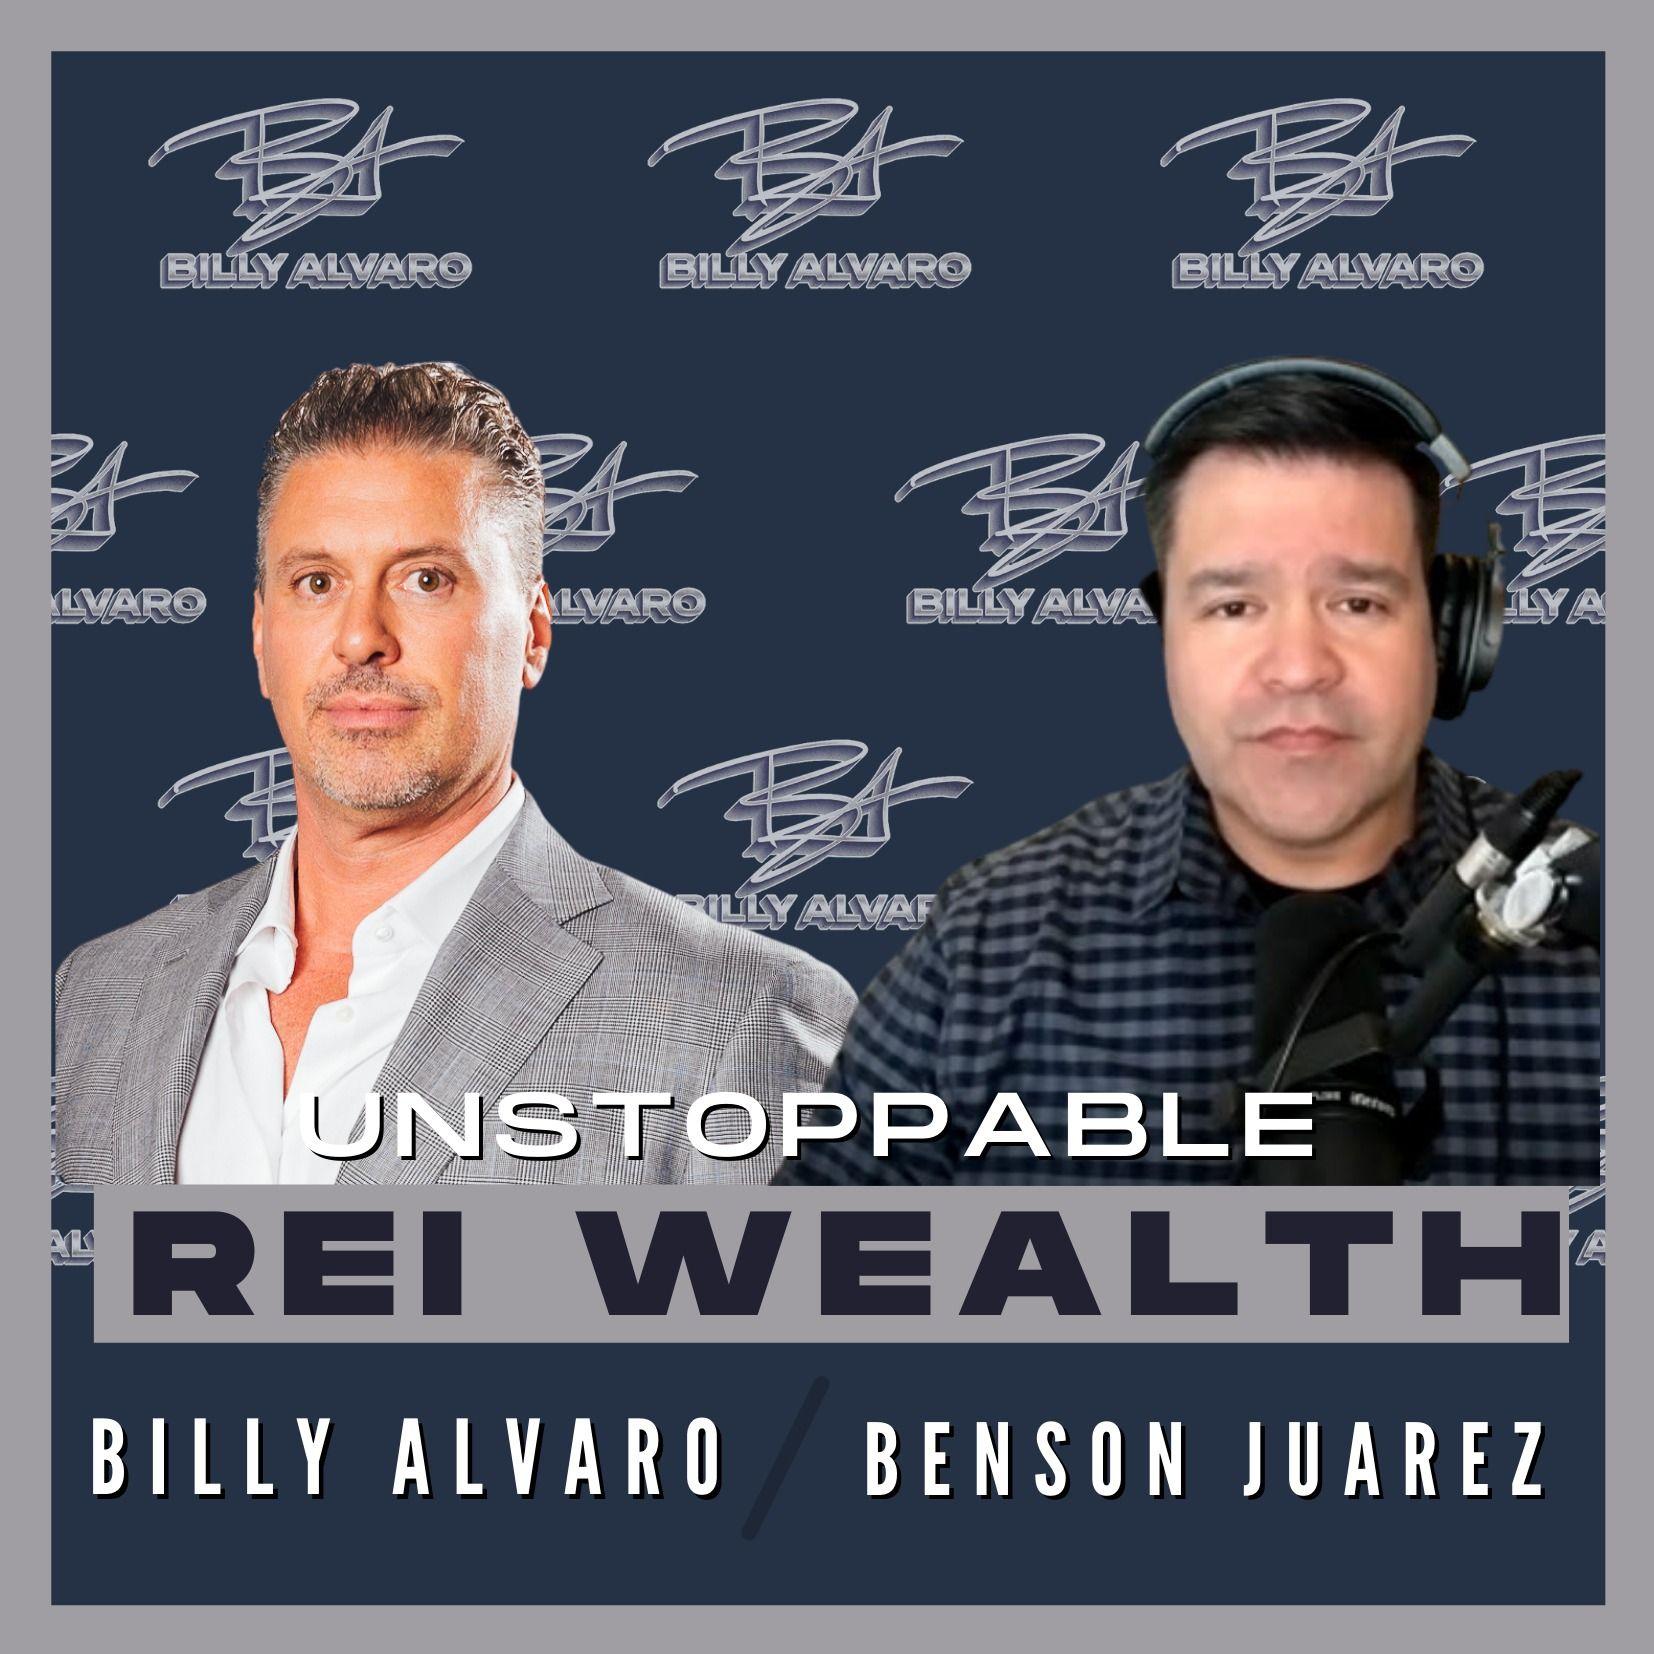 UREI-31 Benson Juarez Teaching Us That The MLS Website Does Not Have True Comps In It